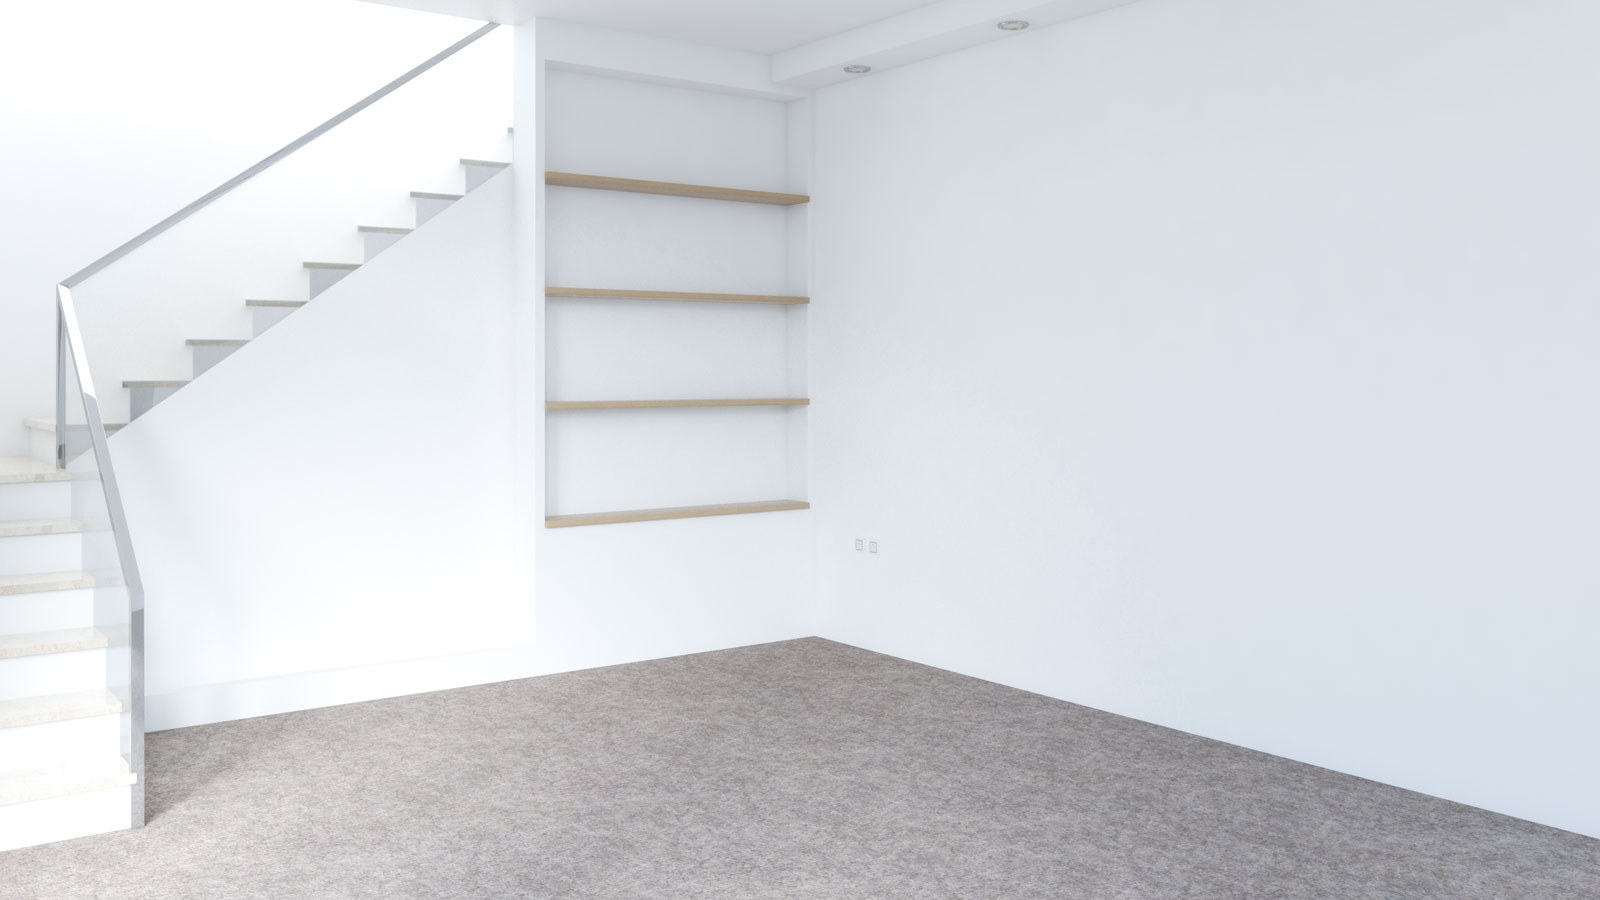 Dark brown carpet with white walls